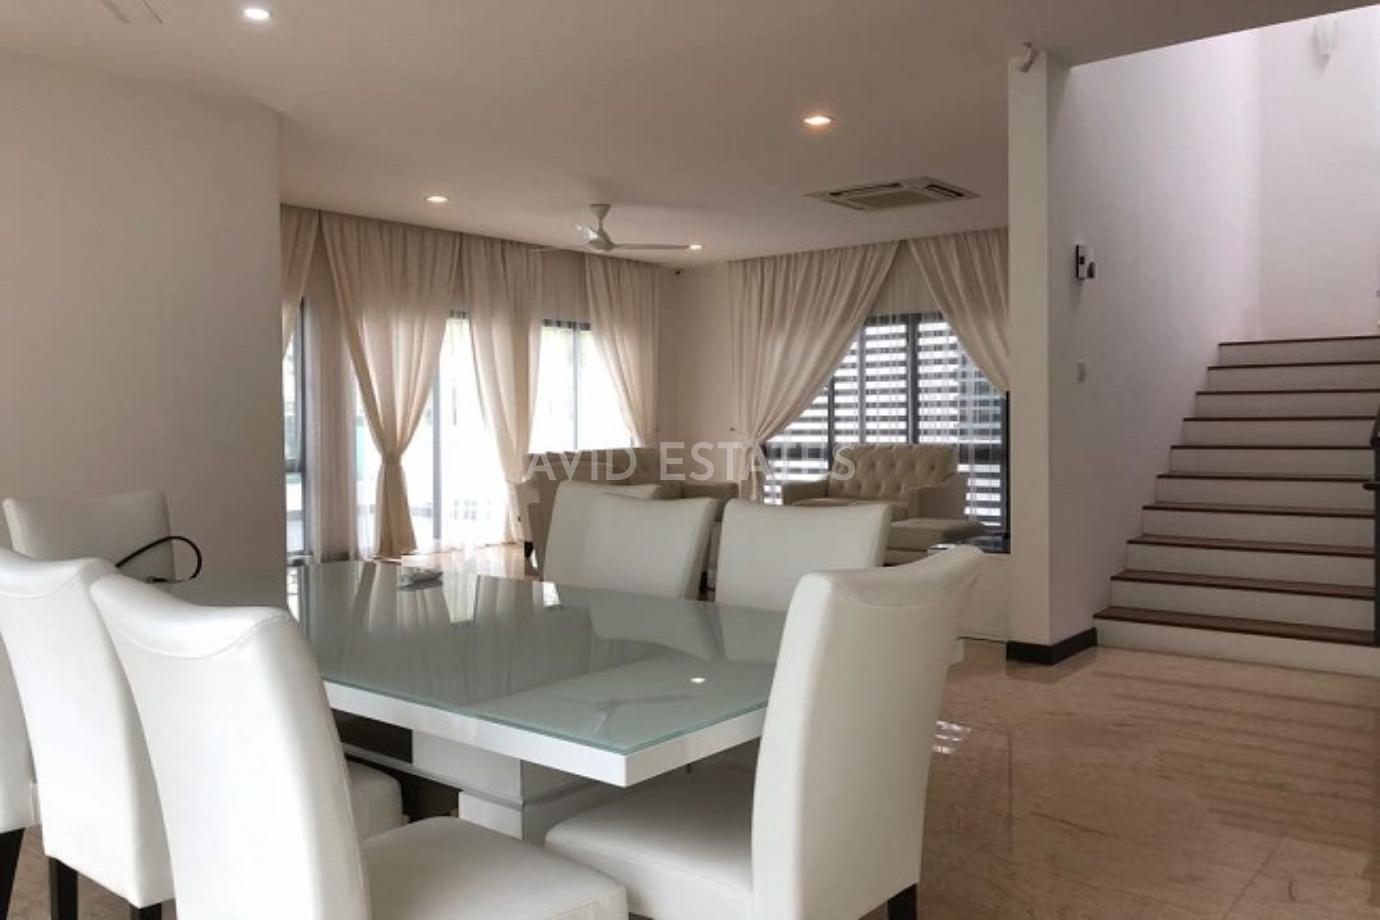 10 Damansara, Damansara Heights,Kuala Lumpur, 5 Bedrooms Bedrooms, ,7 BathroomsBathrooms,Condominium / Serviced Residence,For Sale,10 Damansara,2184